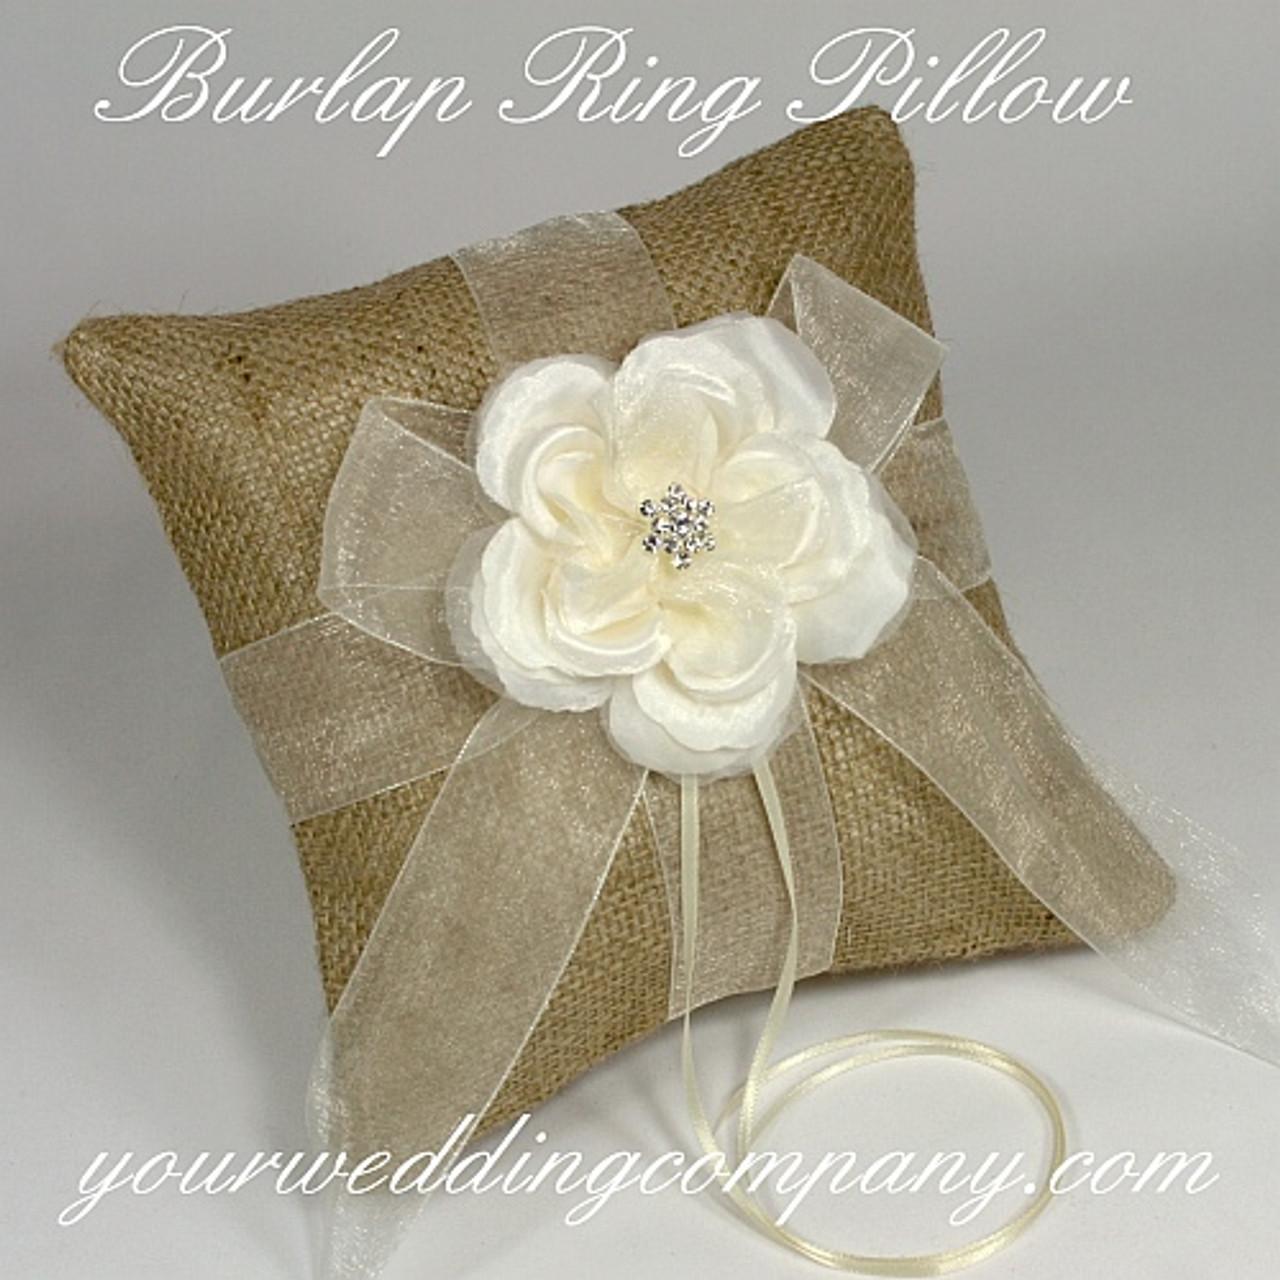 southwestern wedding hessian ring cushion rustic wedding beige satin ribbons Minimalist burlap ring bearer pillow beach